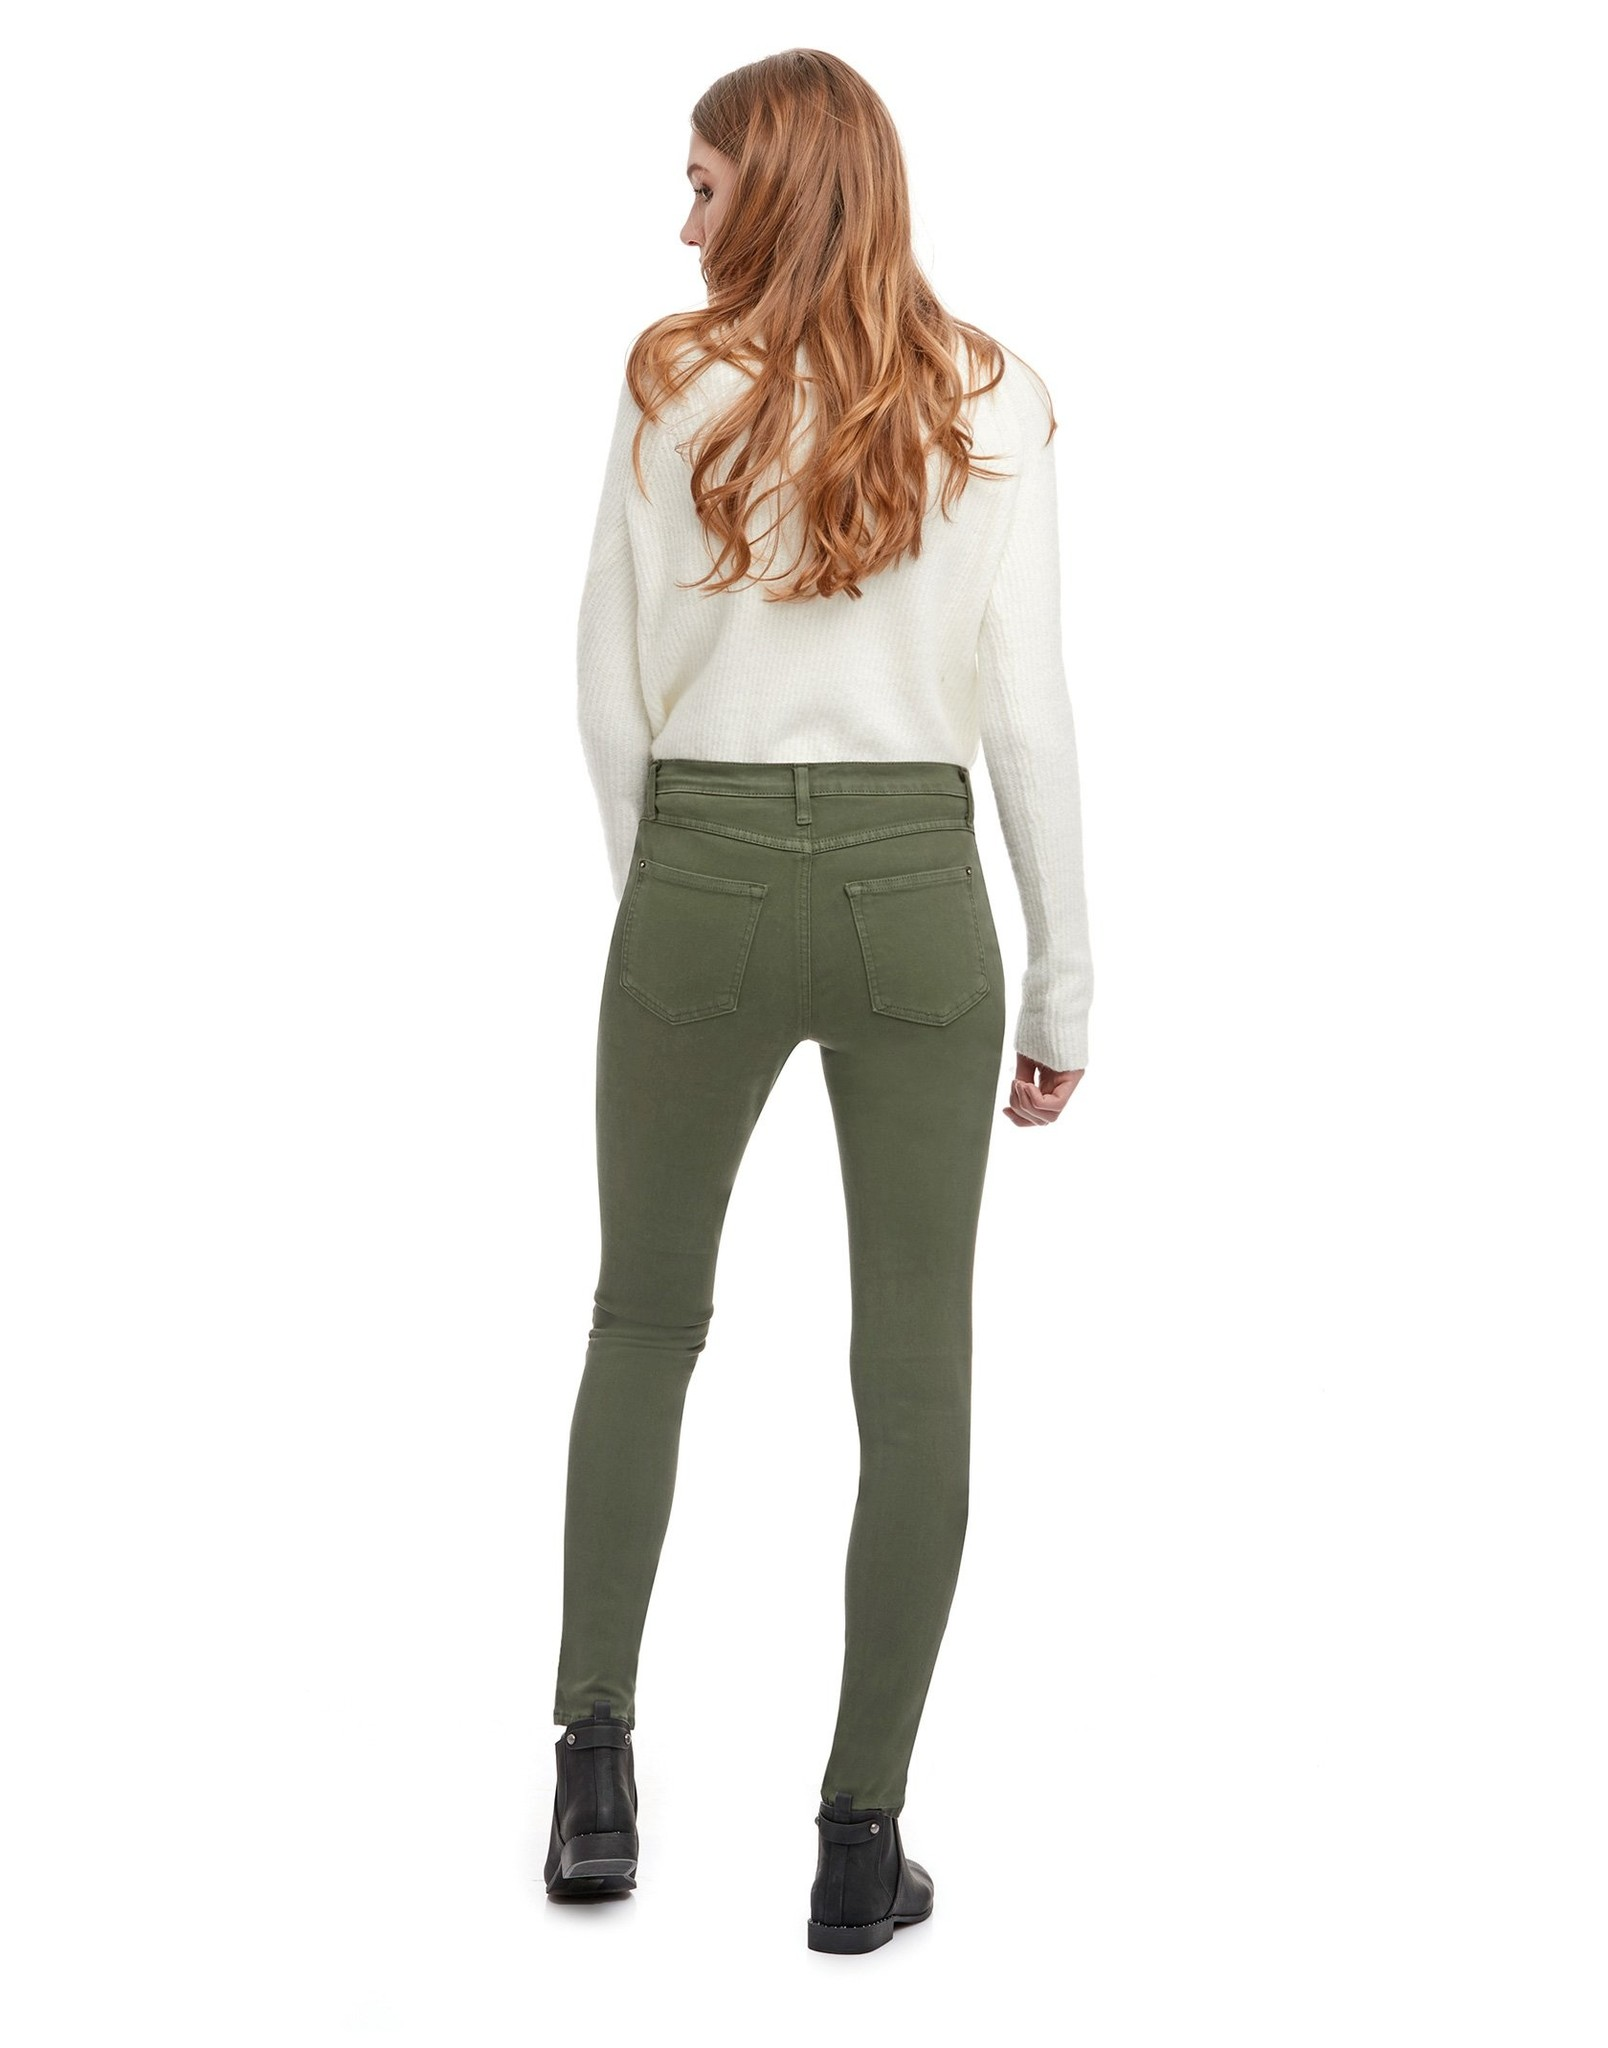 Yoga Jeans 1711 Cl R 30 Kiwi